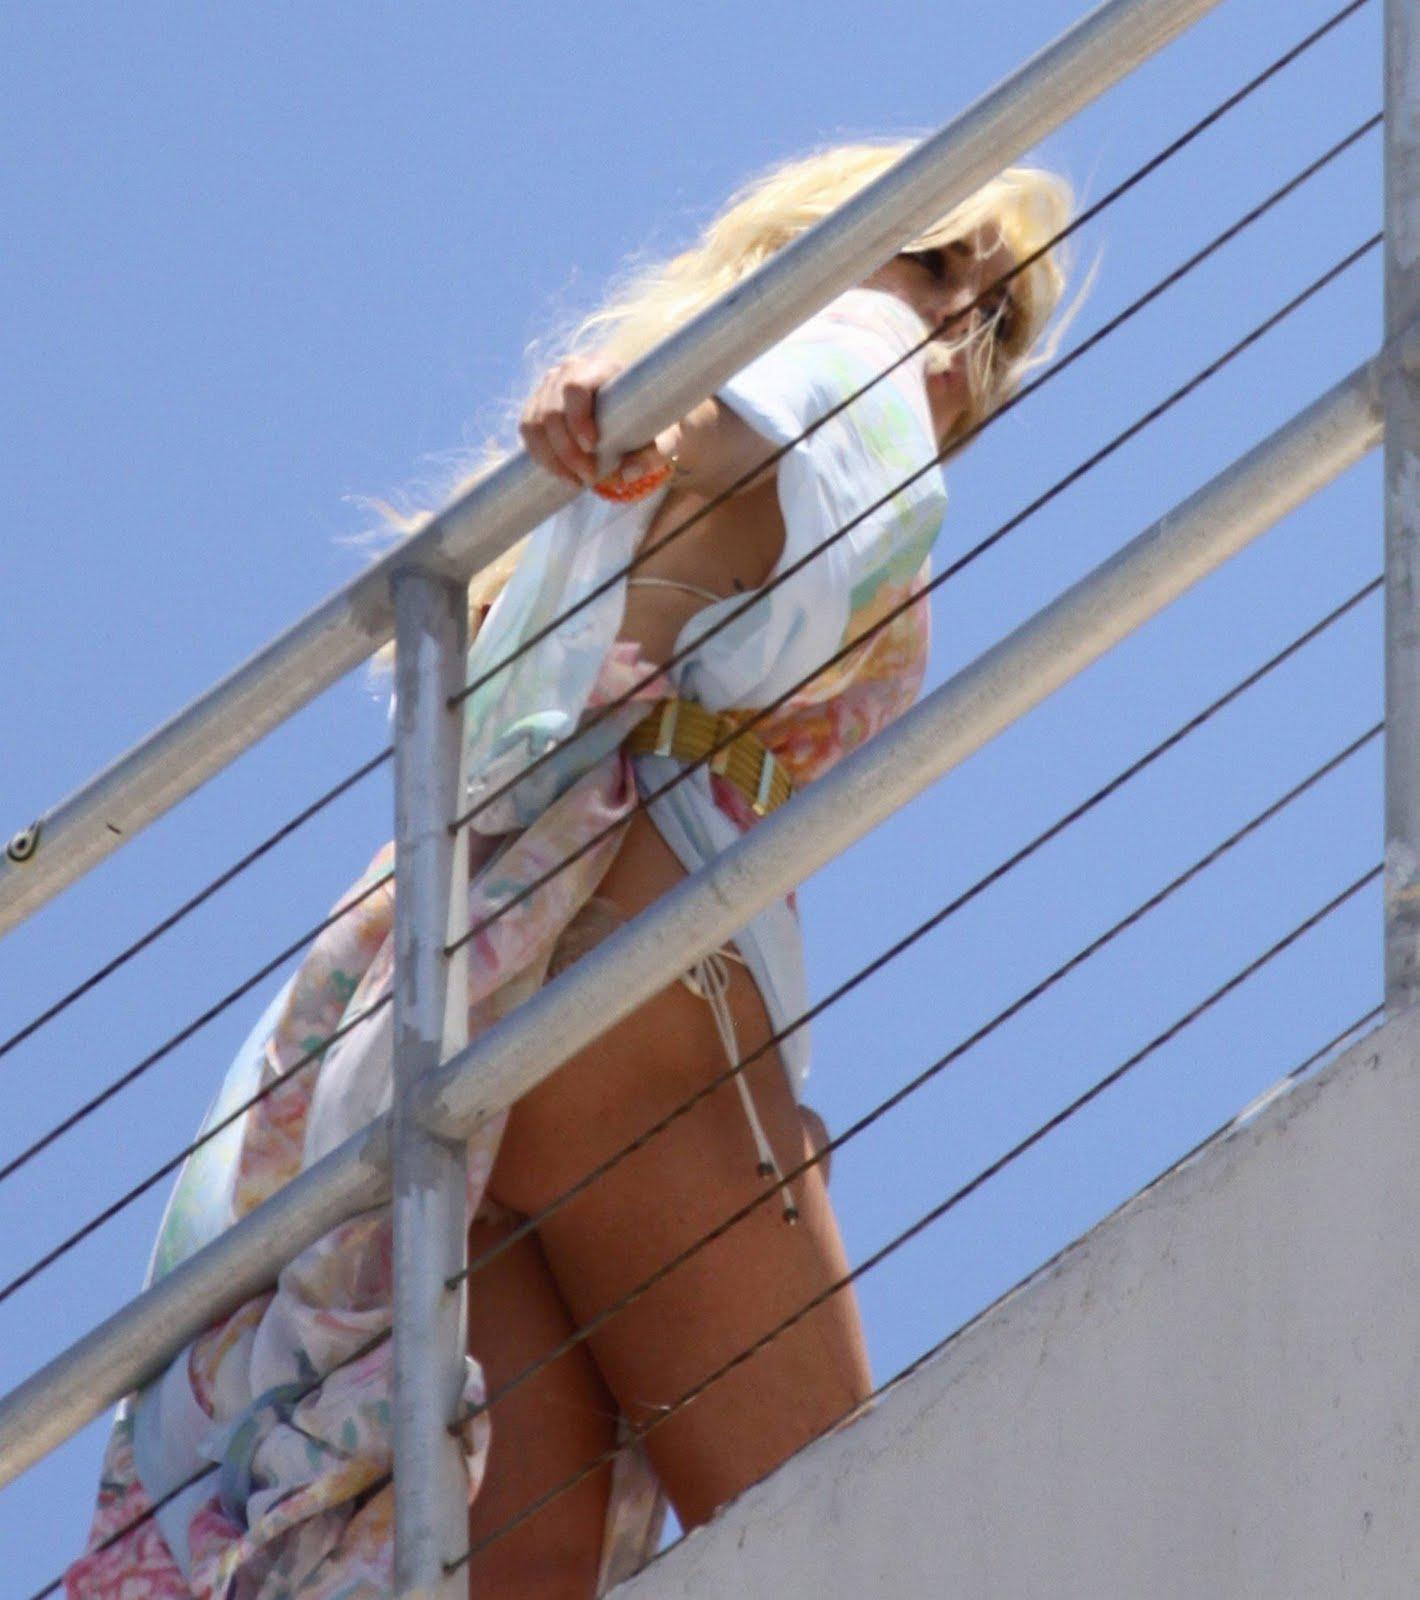 подглядывание за девками на лестнице фото лишь одна